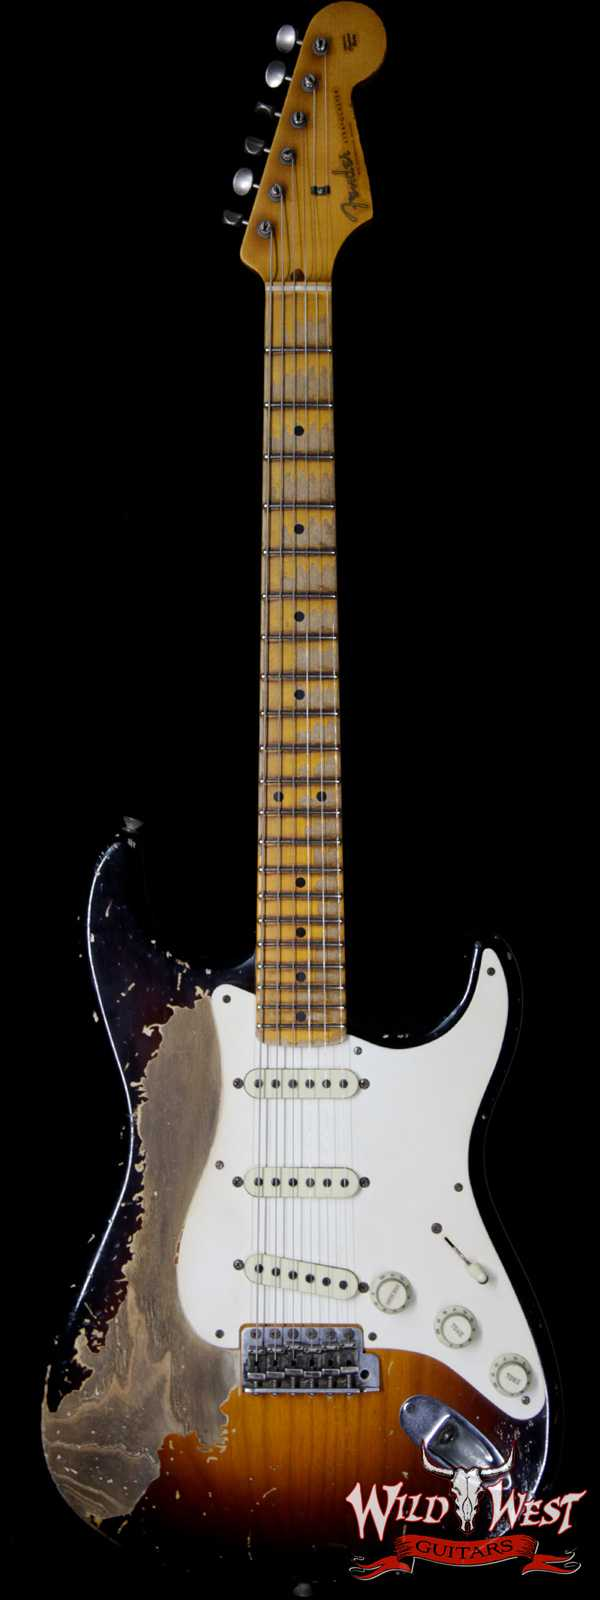 Fender Custom Shop John Cruz Masterbuilt 1957 Stratocaster Ash Heavy Relic 2 Tone Sunburst 6.85 LBS